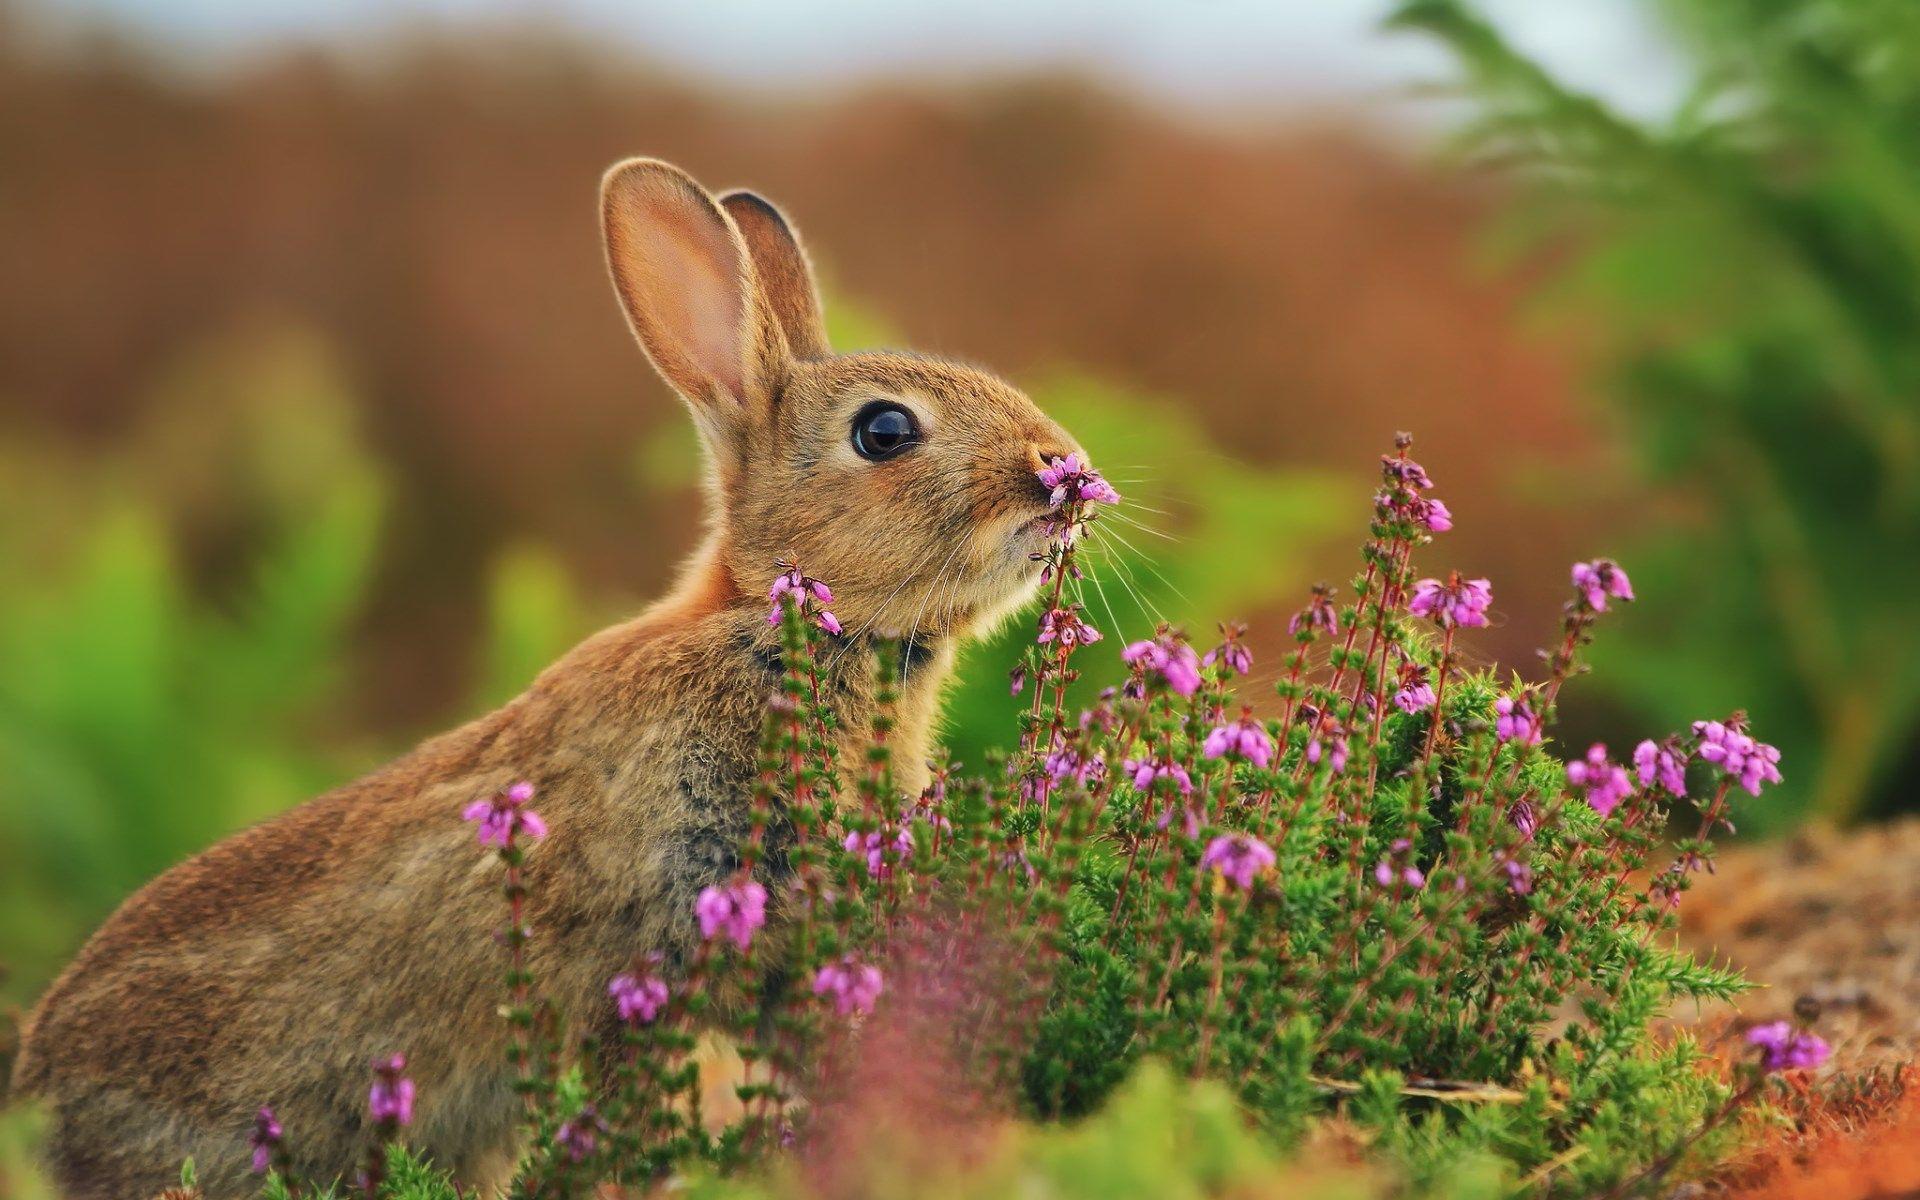 Bunny Wallpapers For Mac Desktop Bunny Wallpaper Rabbit Wallpaper Animal Wallpaper